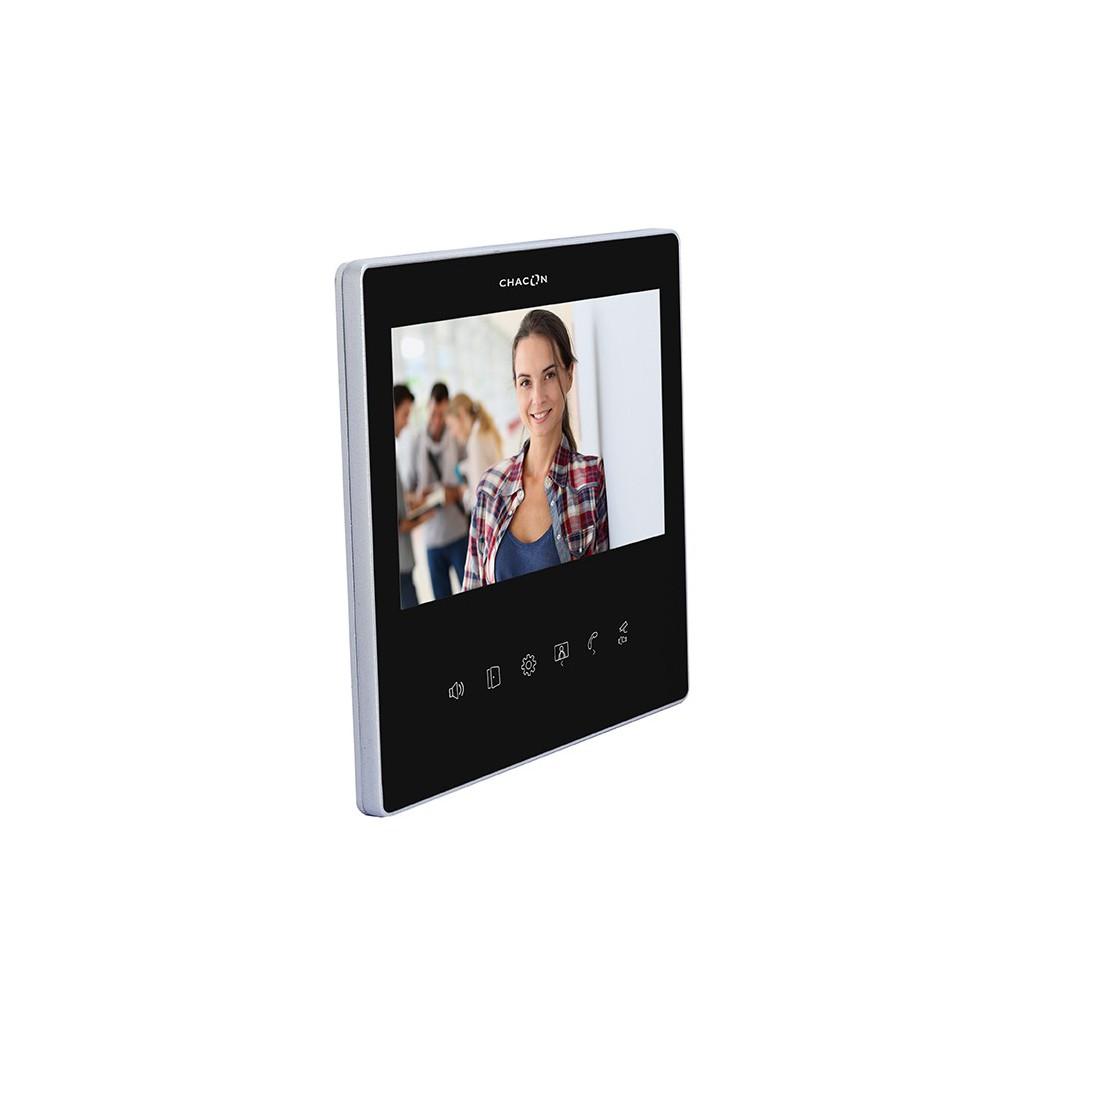 """Pantalla LCD 7"""" adicional - Ne""groUltra Slim para 34844 & 34863"